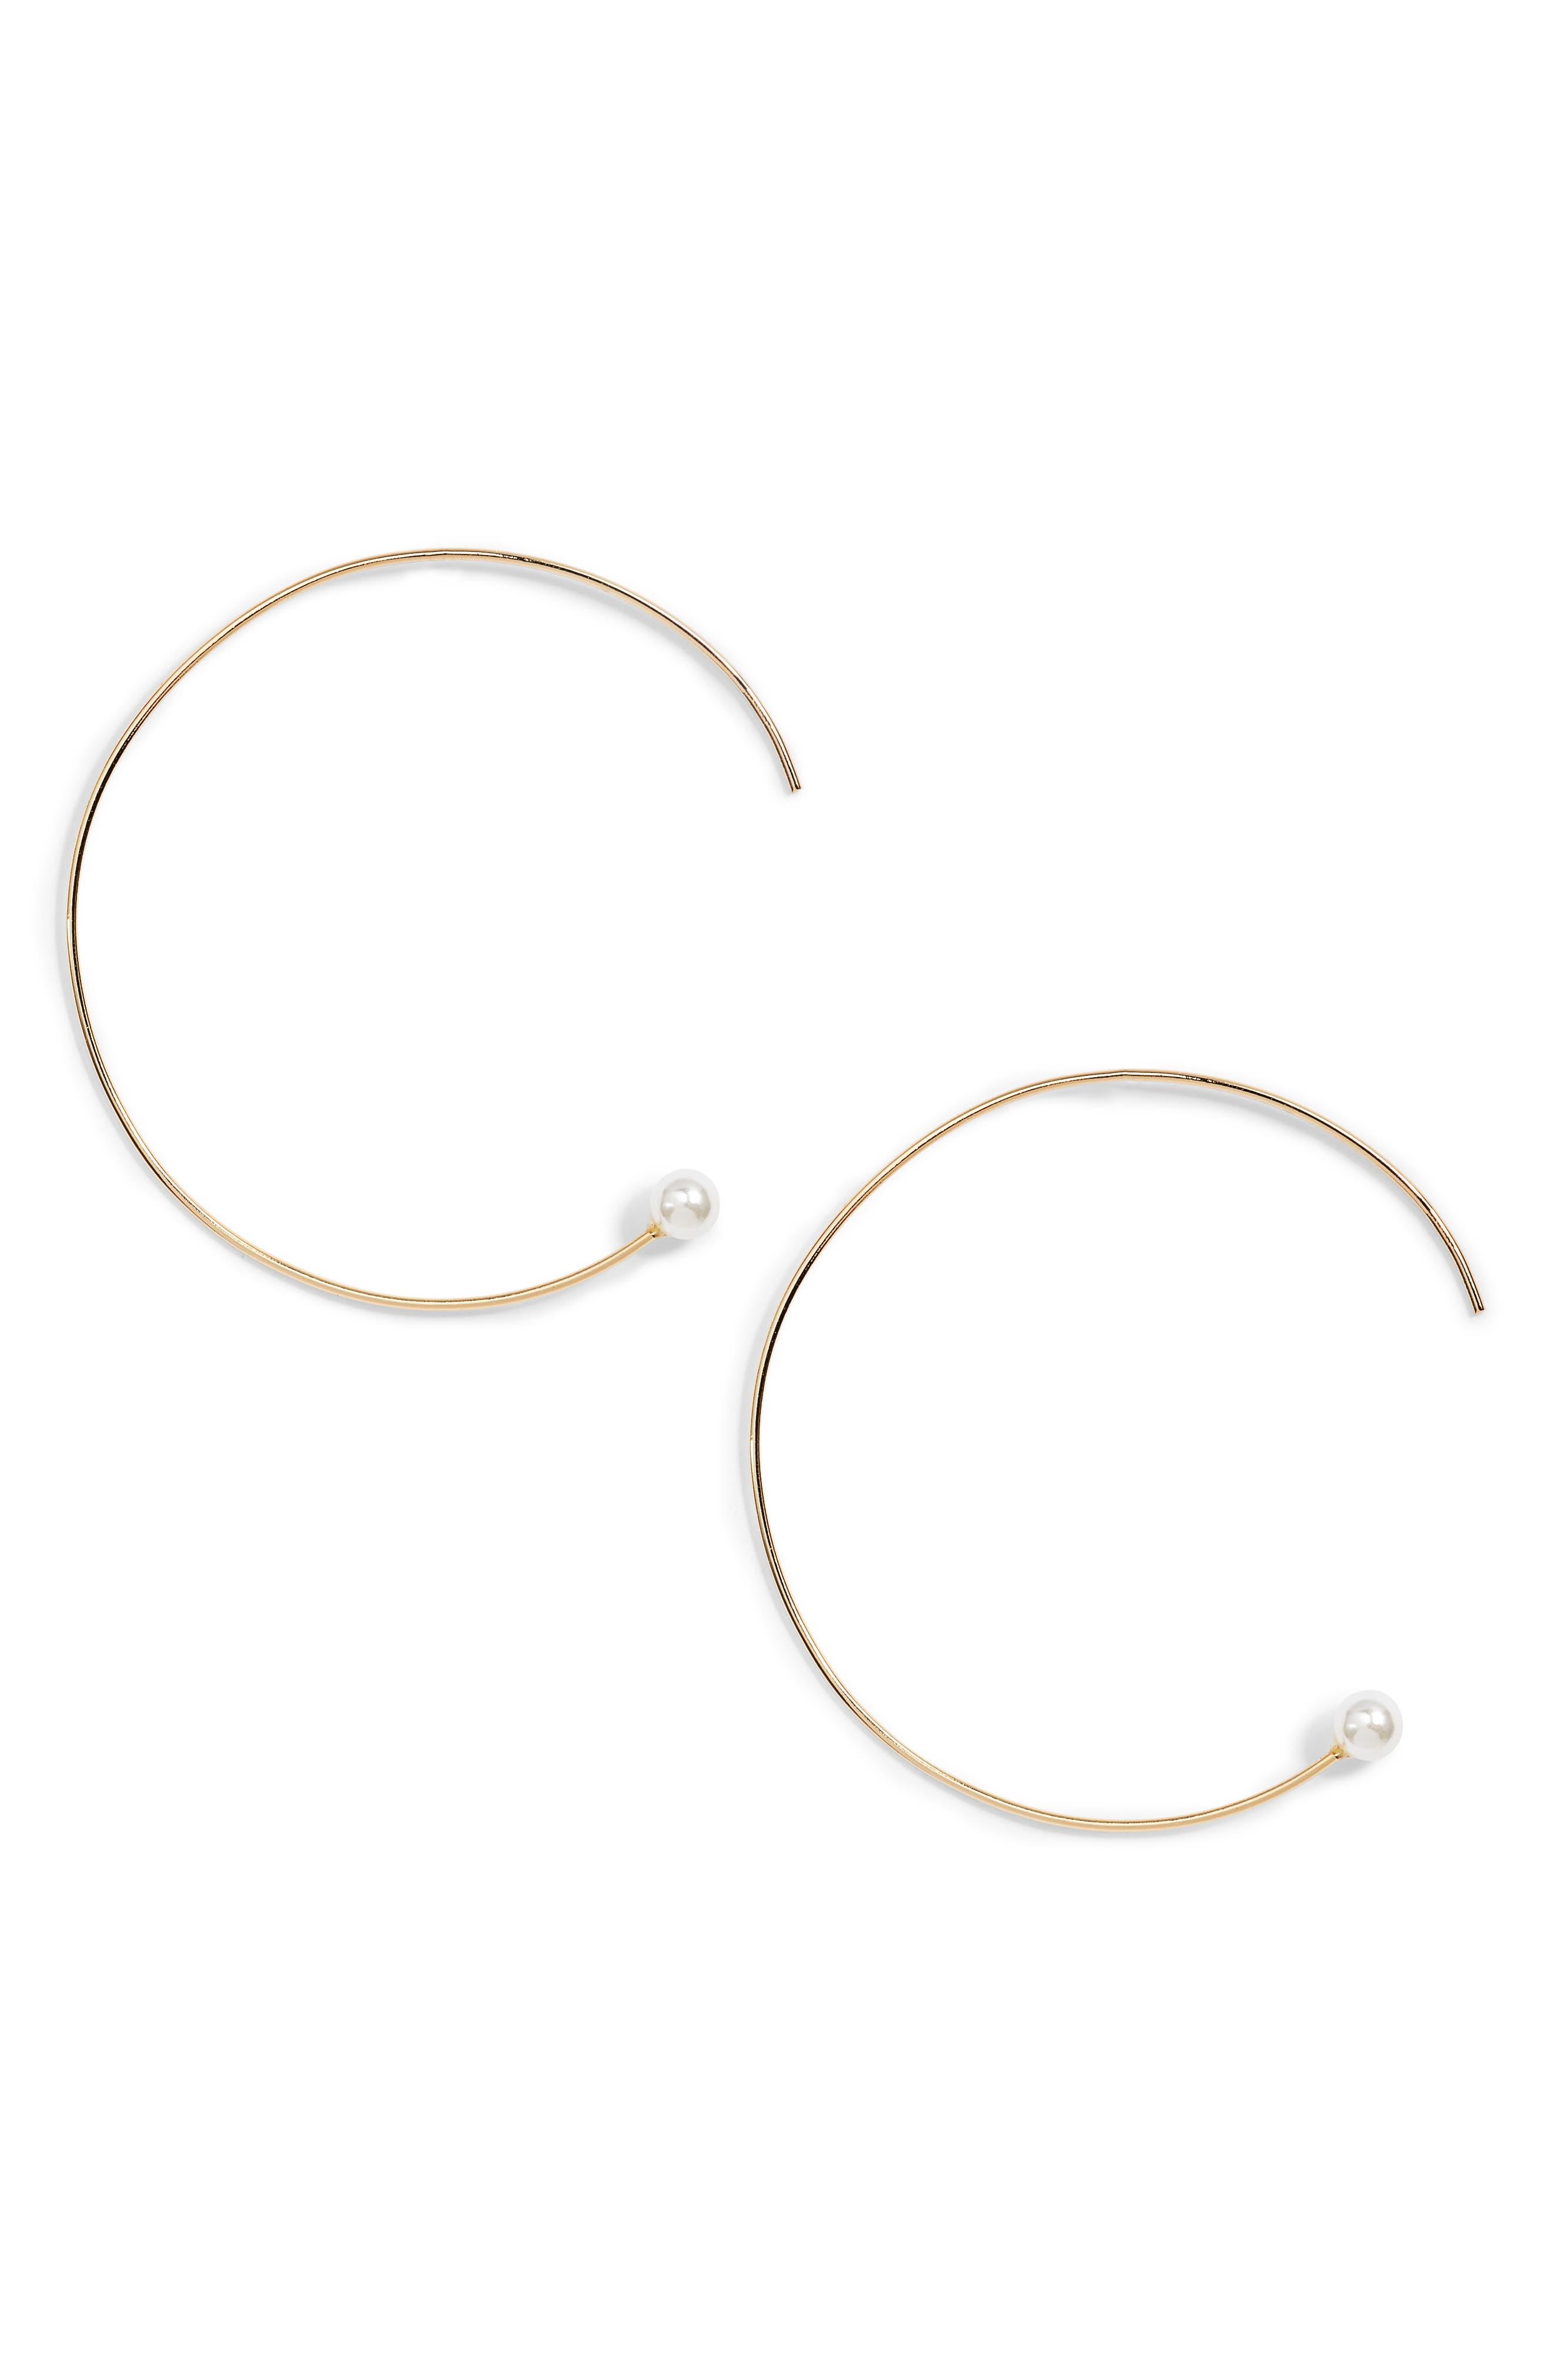 Main Image - Jules Smith Yoshi Imitation Pearl Hoop Earrings